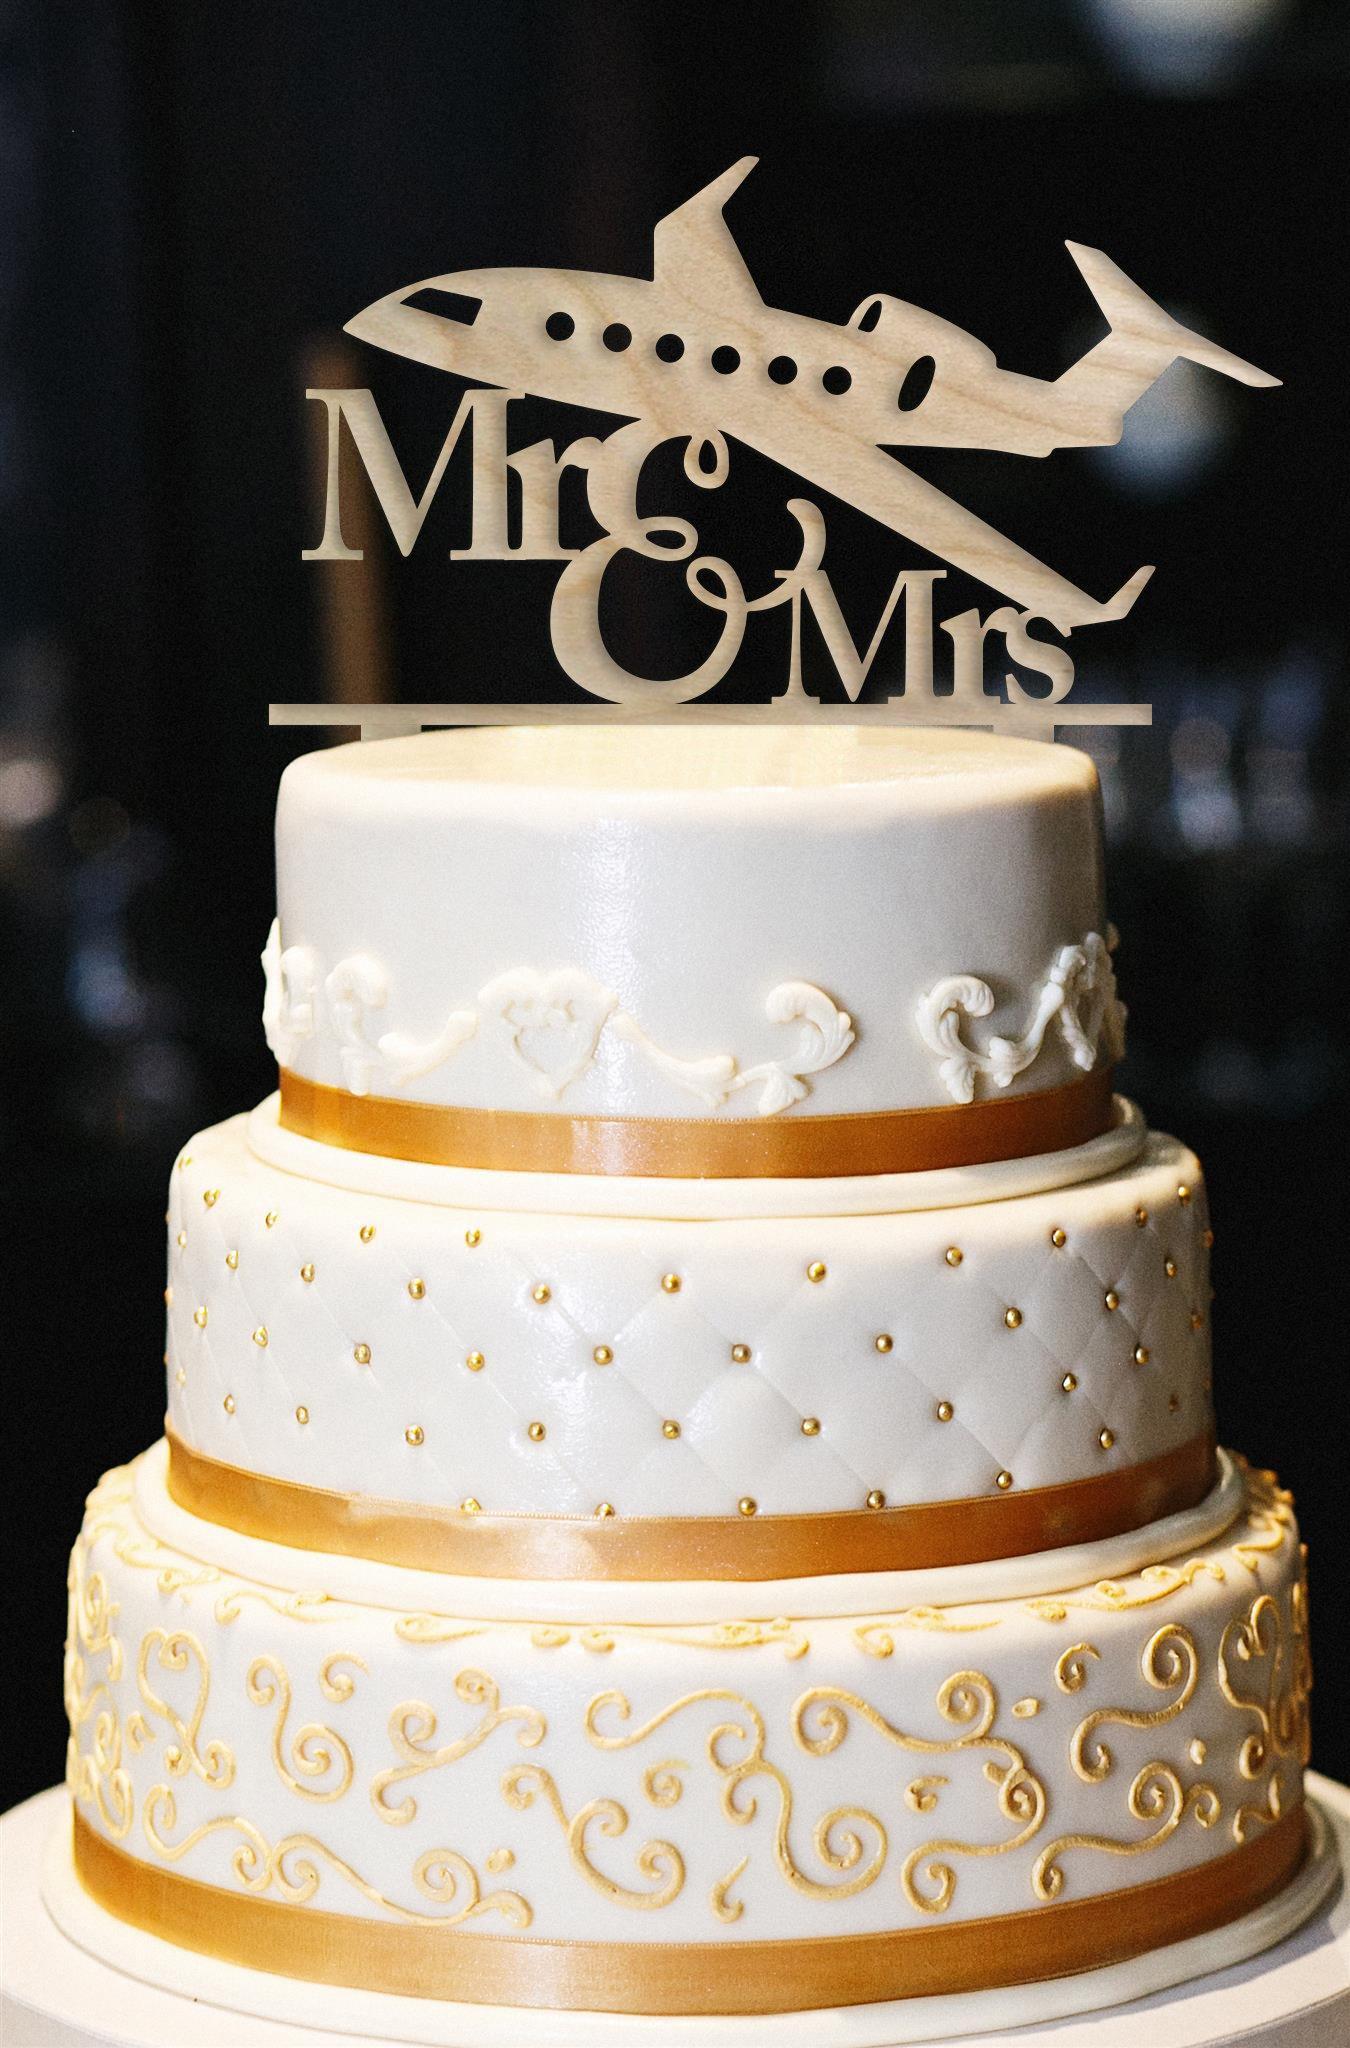 Mr & Mrs Wedding Cake Topper, Airplane Wedding Cake Topper, Gold Wedding Cake Topper, Wedding Cake Topper, Gold Glitter Wedding Cake Topper (6'', Wood)